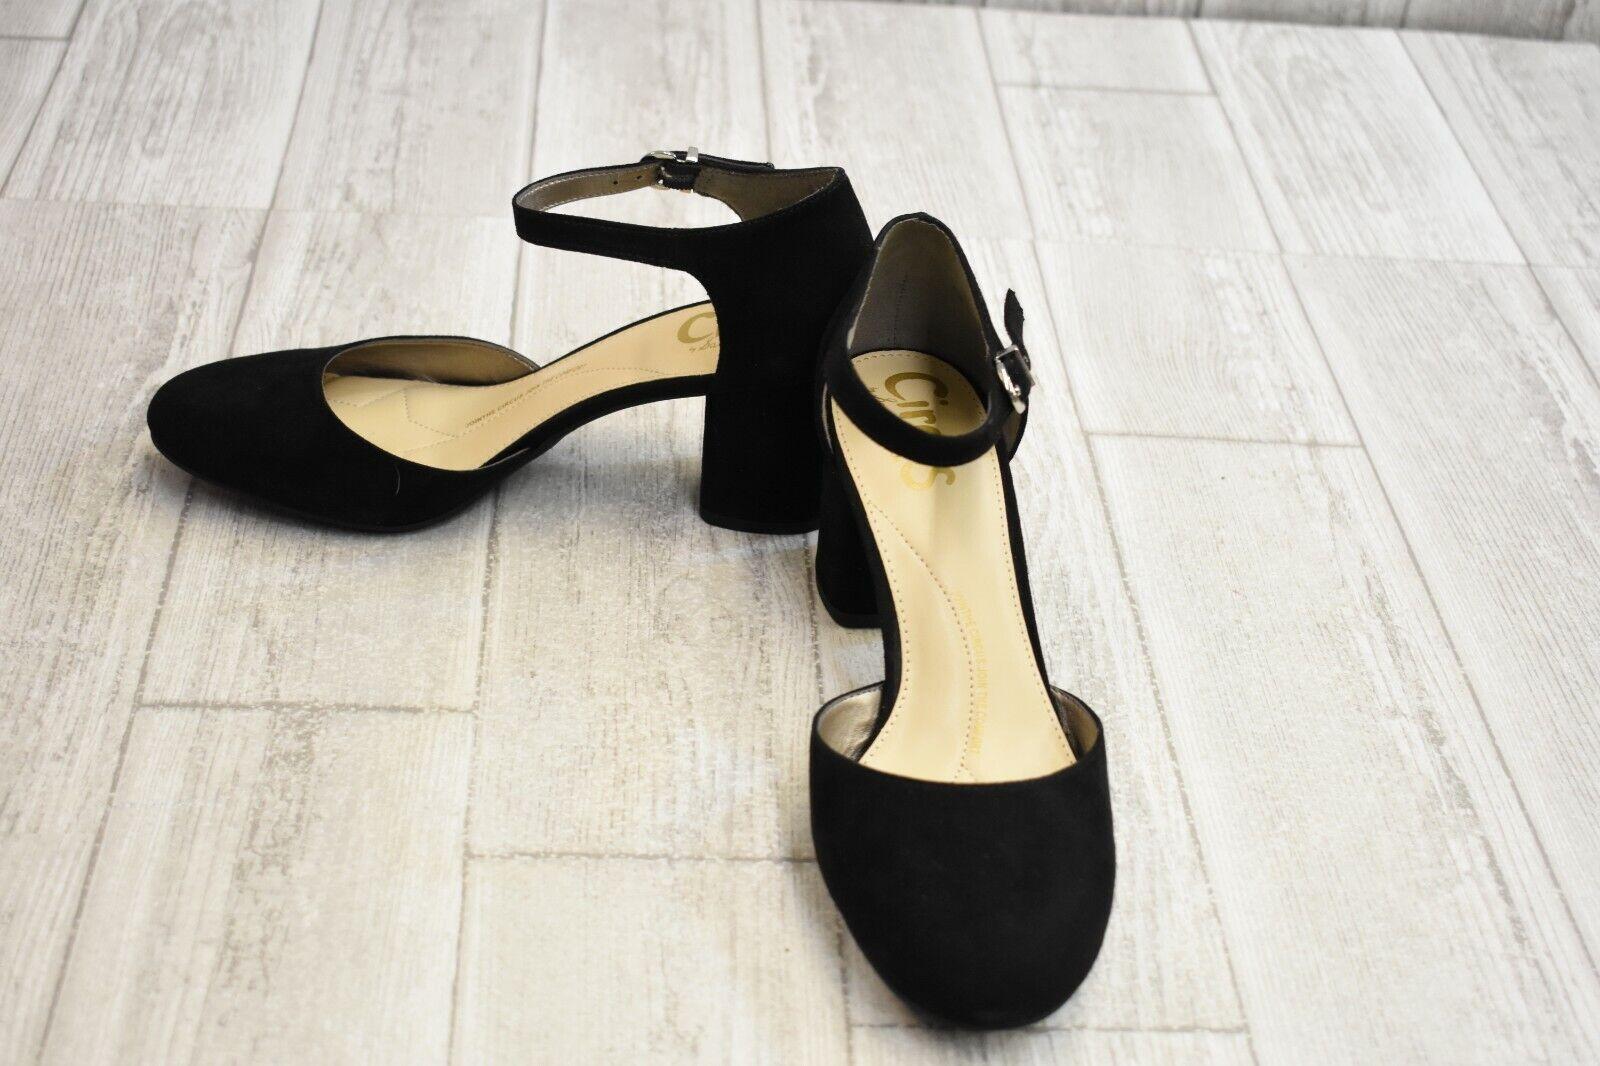 Circus by Sam Edelman Joelle Heels - Women's Size 7.5 M - Black